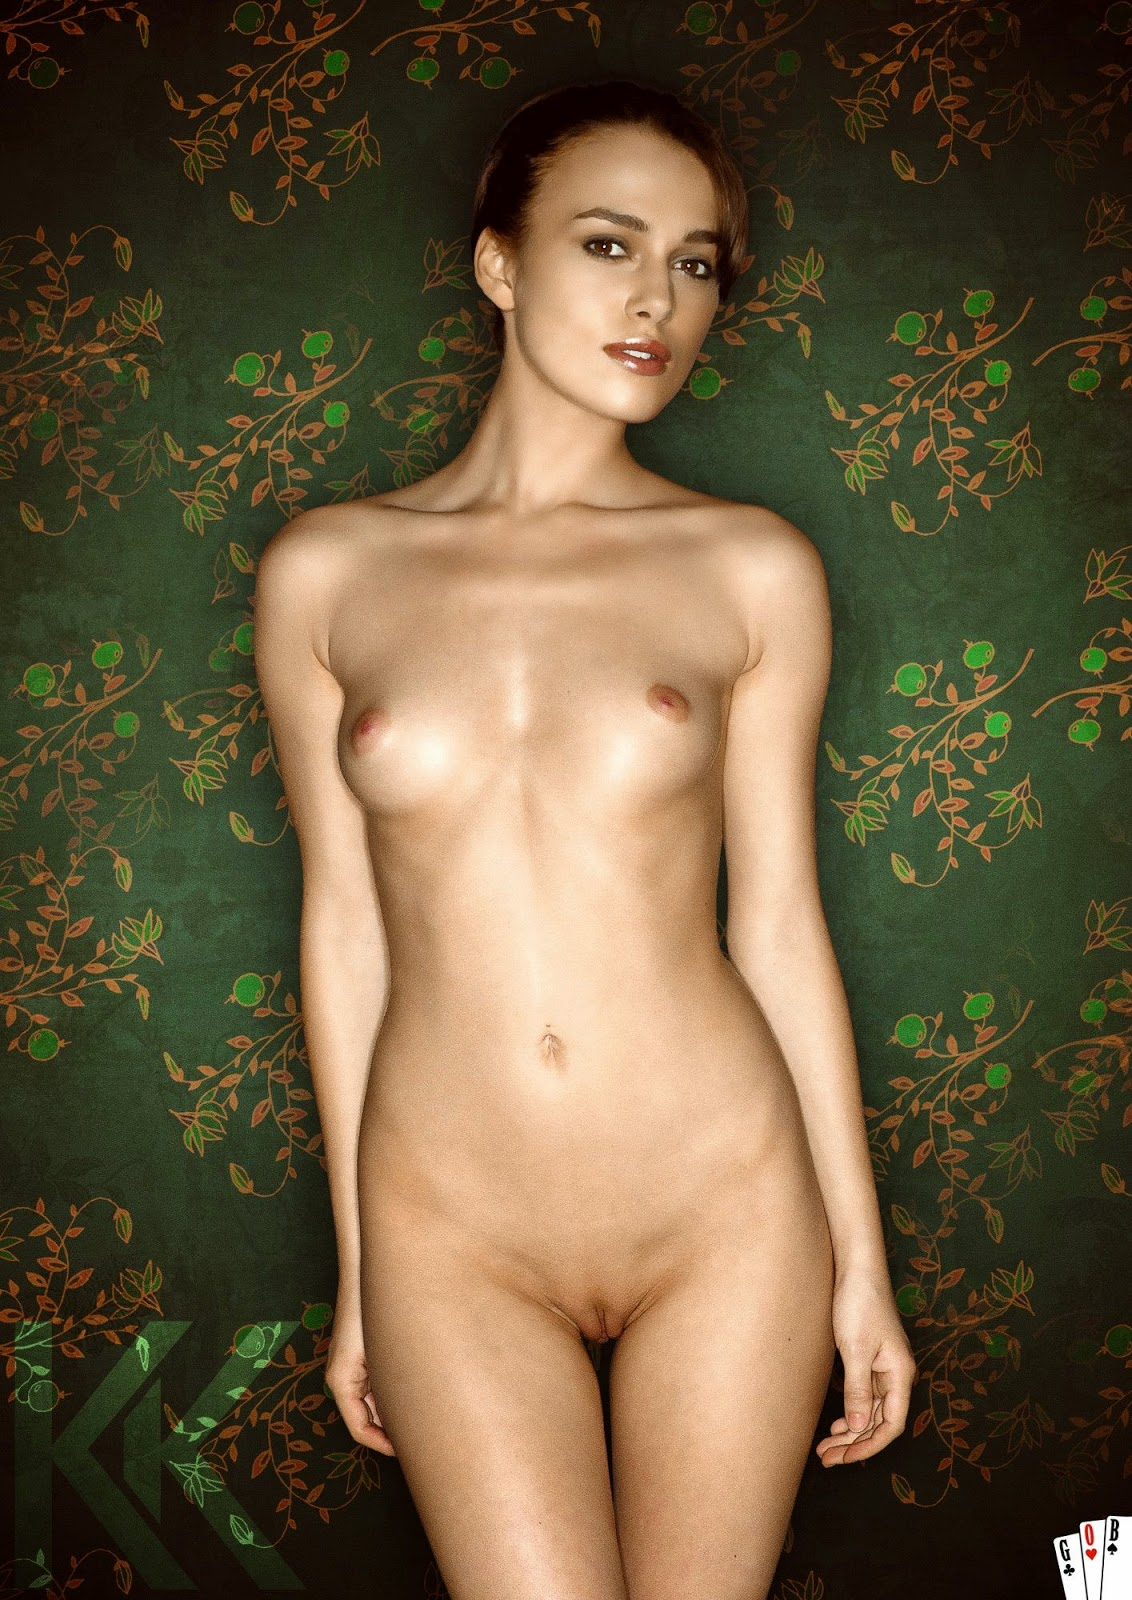 Keira knightley nude celebrities